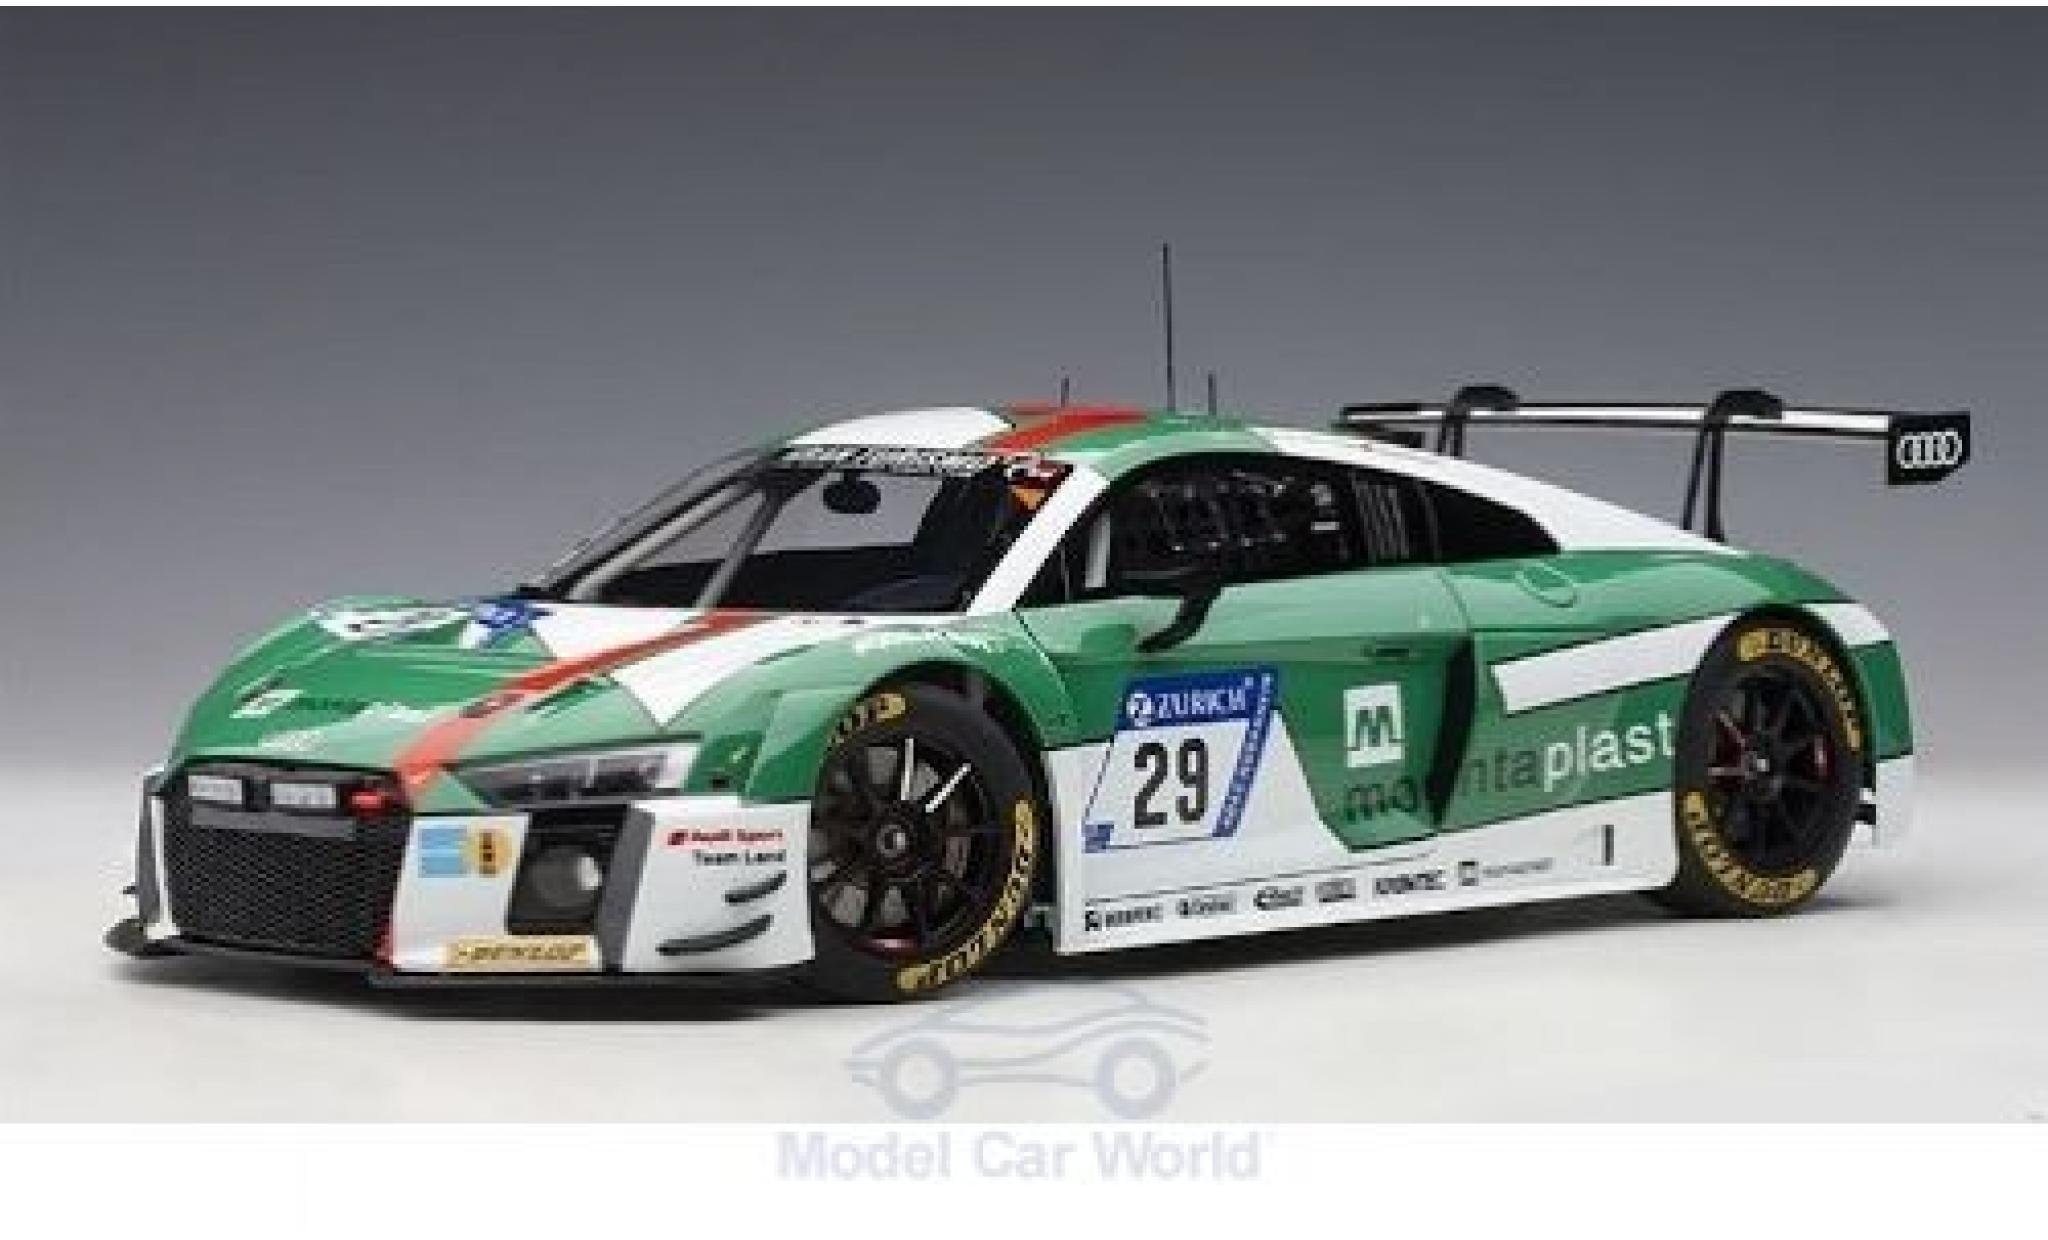 Audi R8 1/18 AUTOart LMS No.29 24h Nürburgring 2017 K.van der Linde/C.Mies/C.de Phillippi/M.Winkelhock